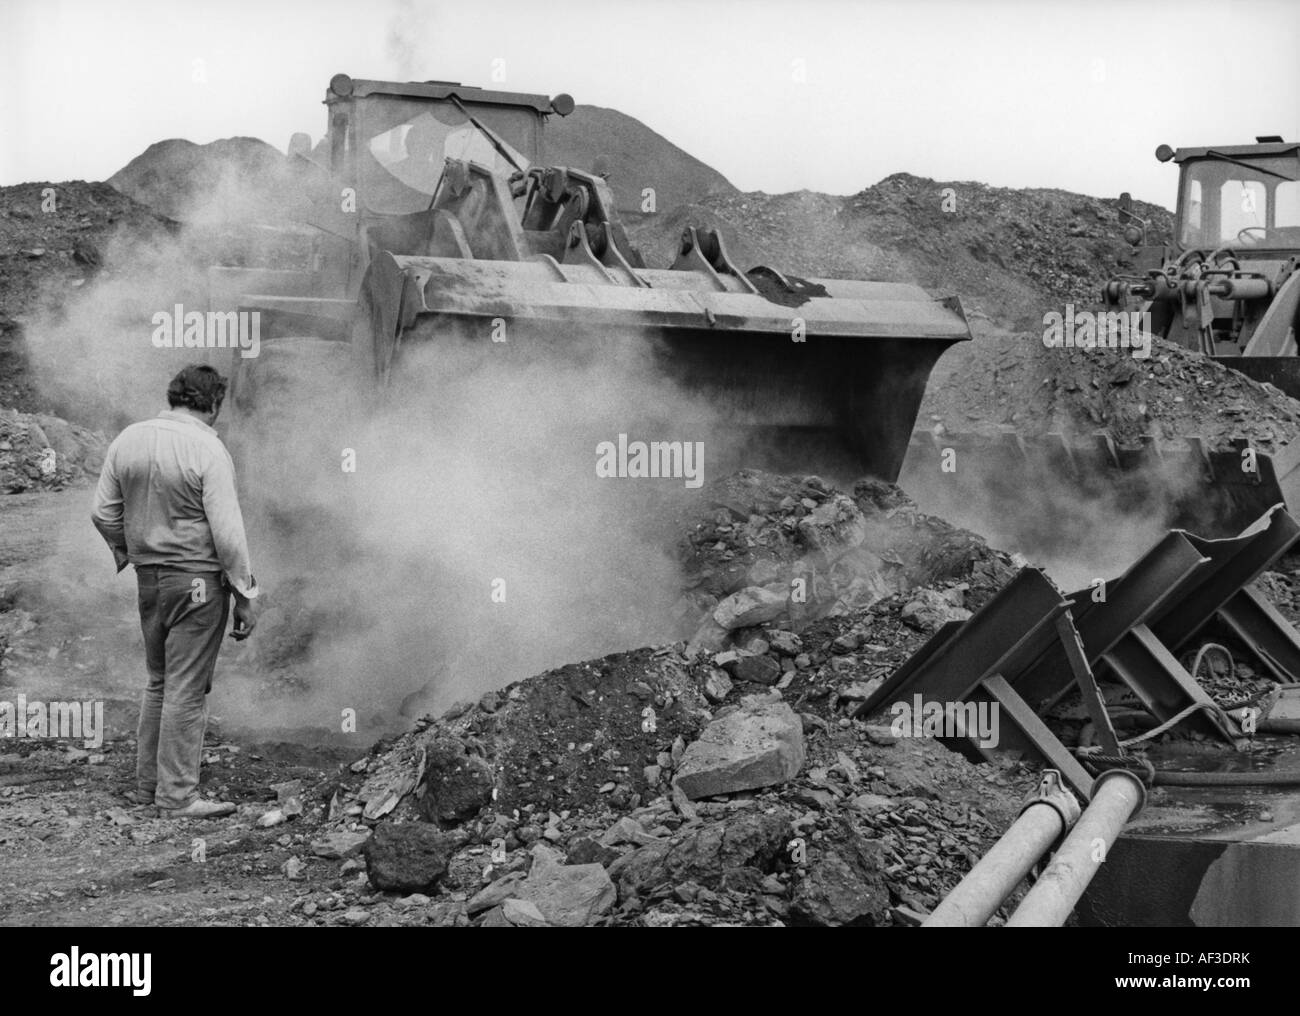 work during the burning coal heap at Oberhausen-Alstaden in 1981, Germany, North Rhine-Westphalia, Ruhr Area, Oberhausen - Stock Image